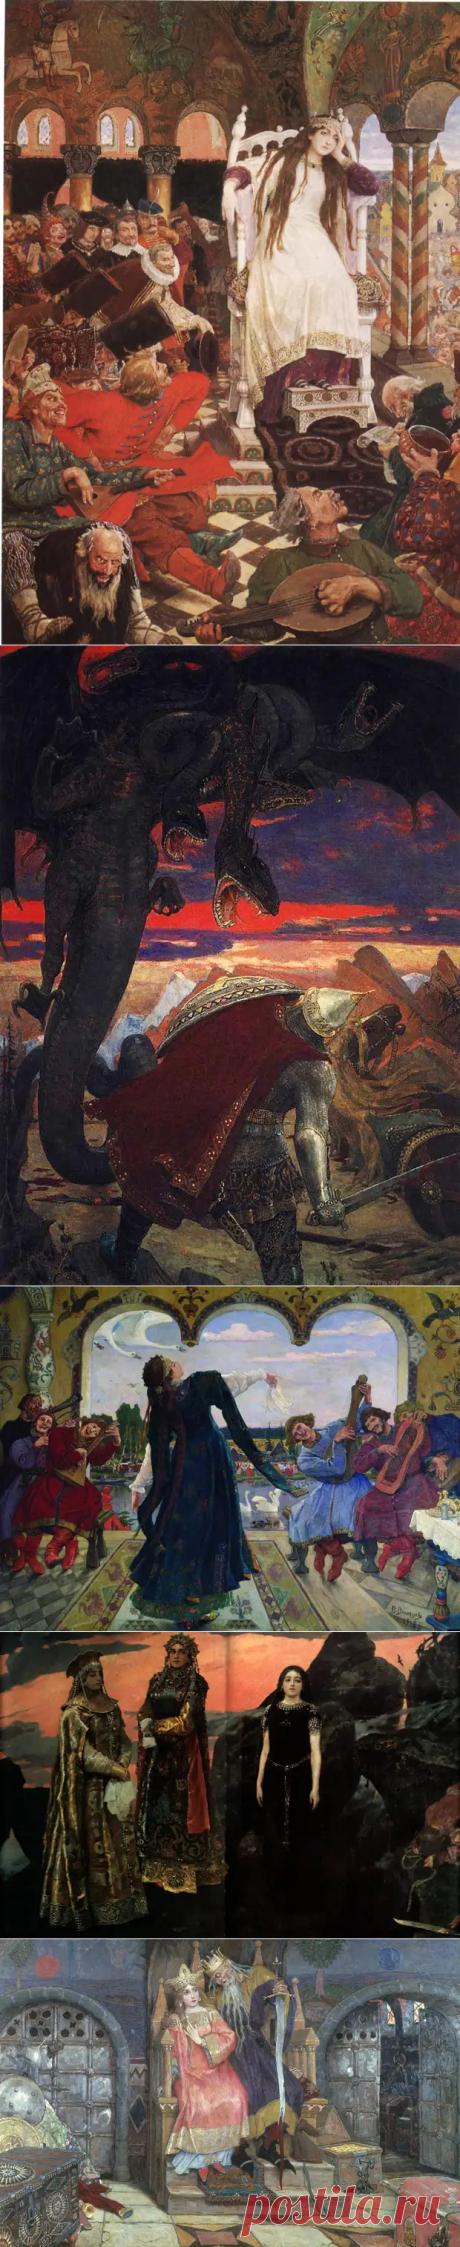 Художник-славянист Васнецов Виктор Михайлович, ч.1